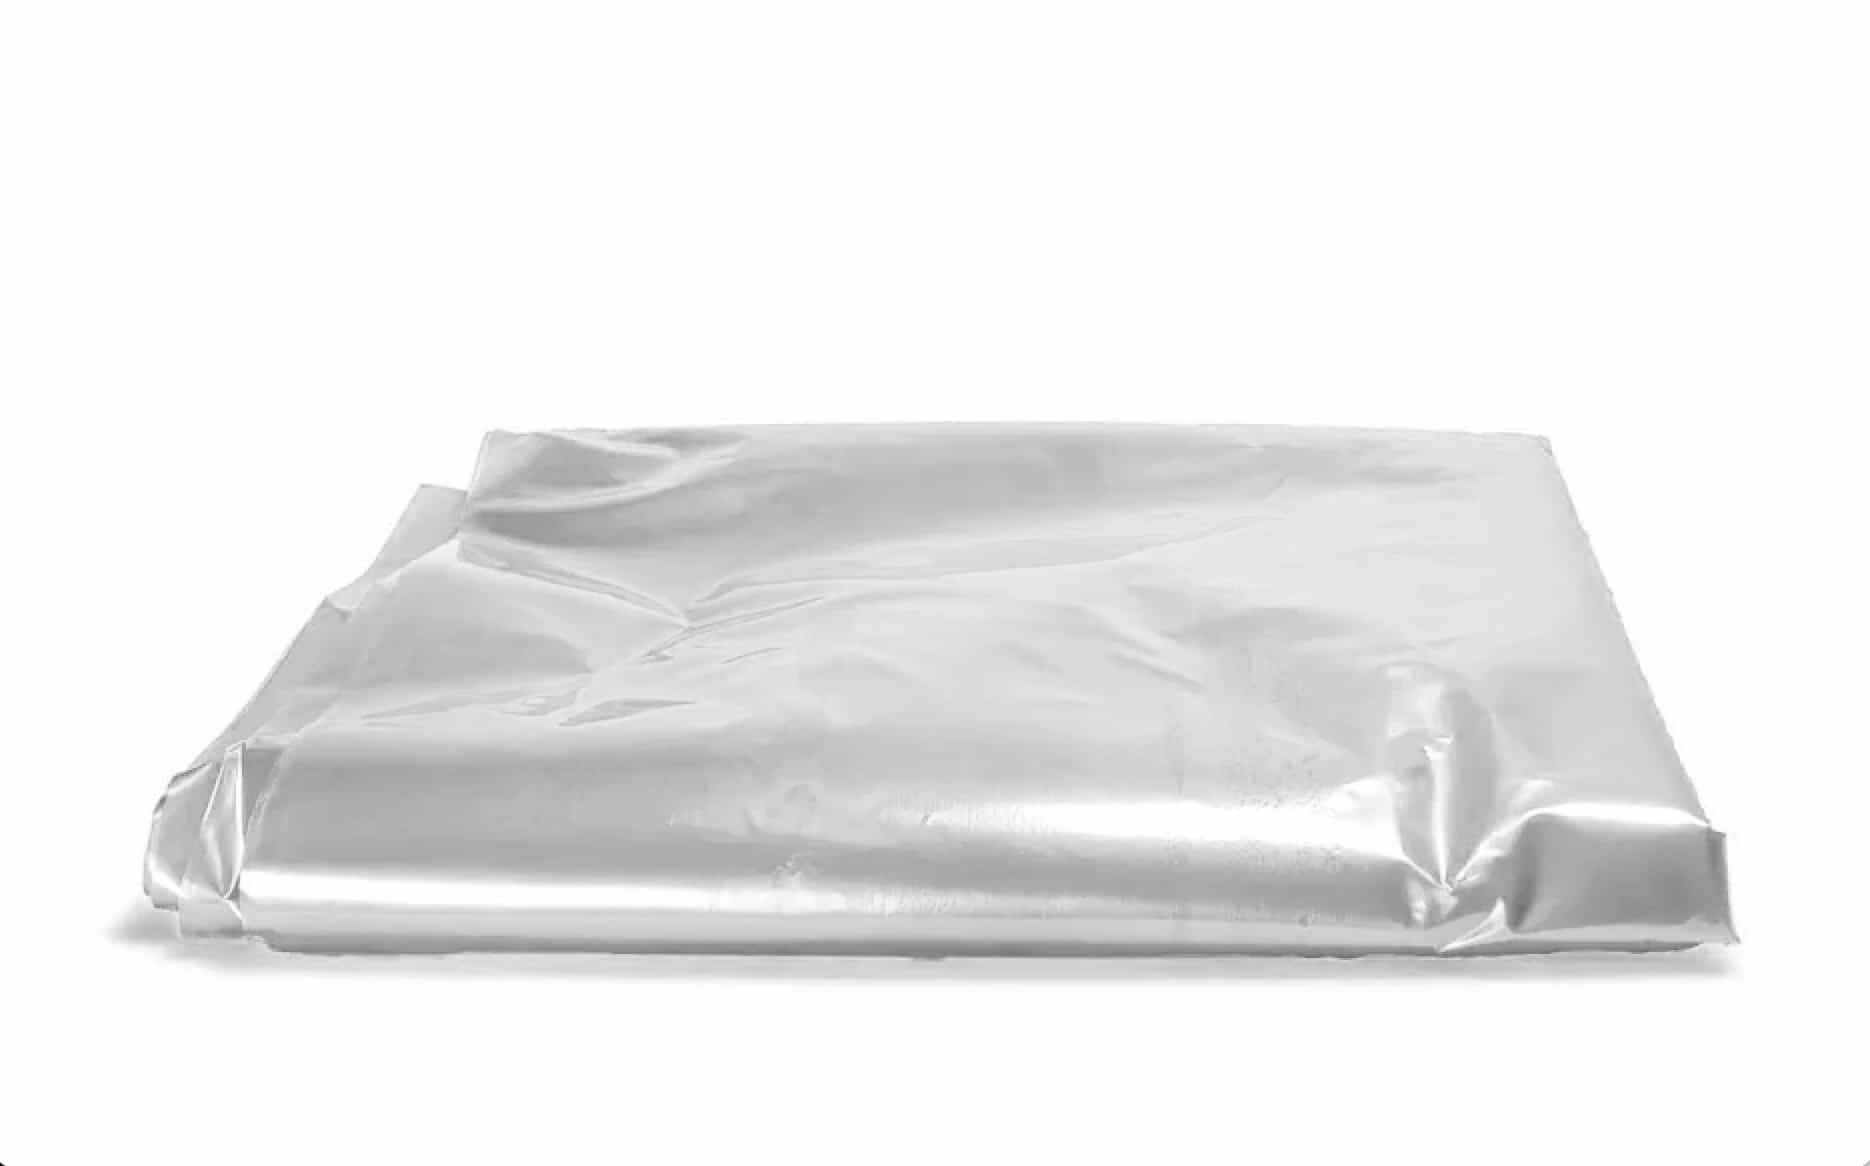 Plastic matrashoes transparant 1,5 persoons - 2300 x 1600 x 220mm